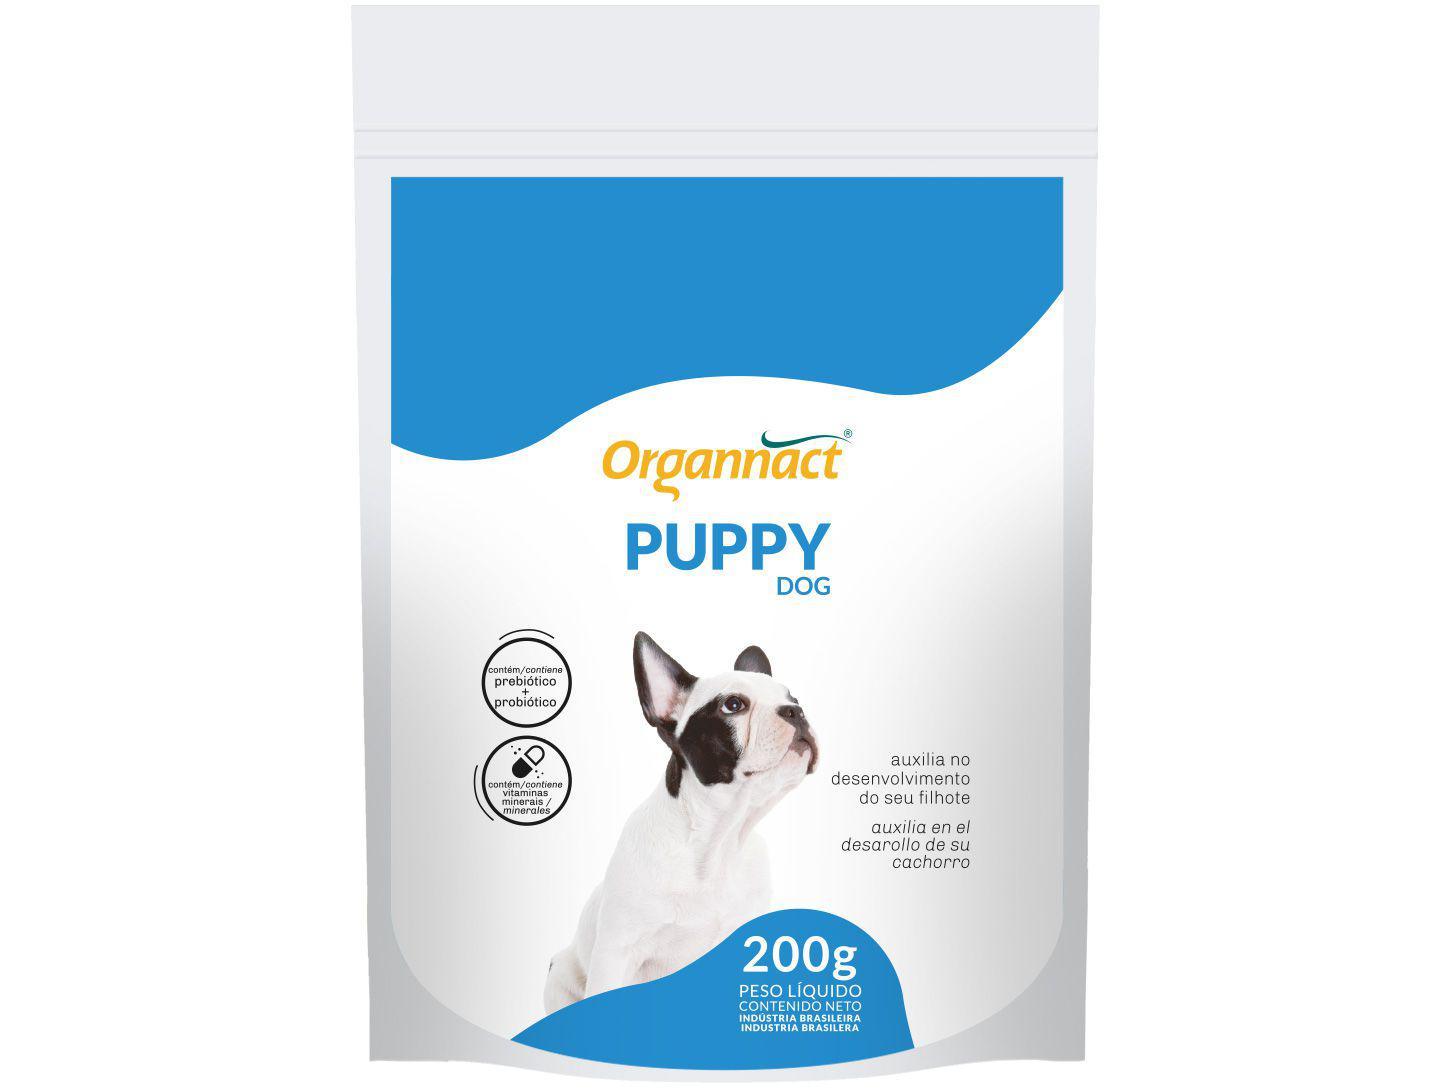 Suplemento Organnact Puppy Dog para Cachorro - 200g